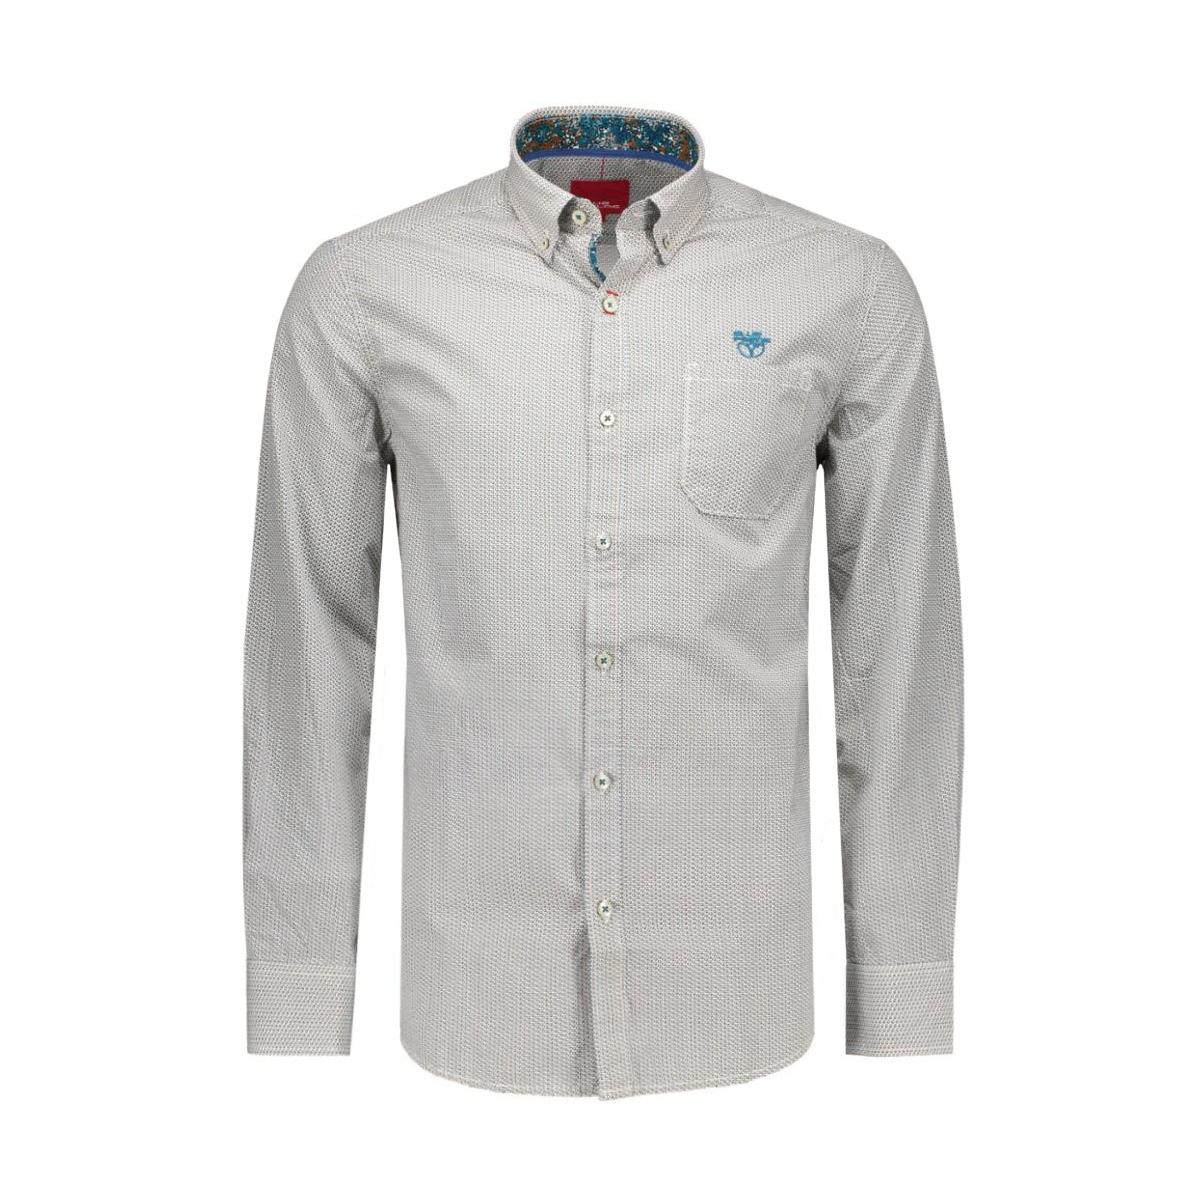 21435005 bluefields overhemd 5511